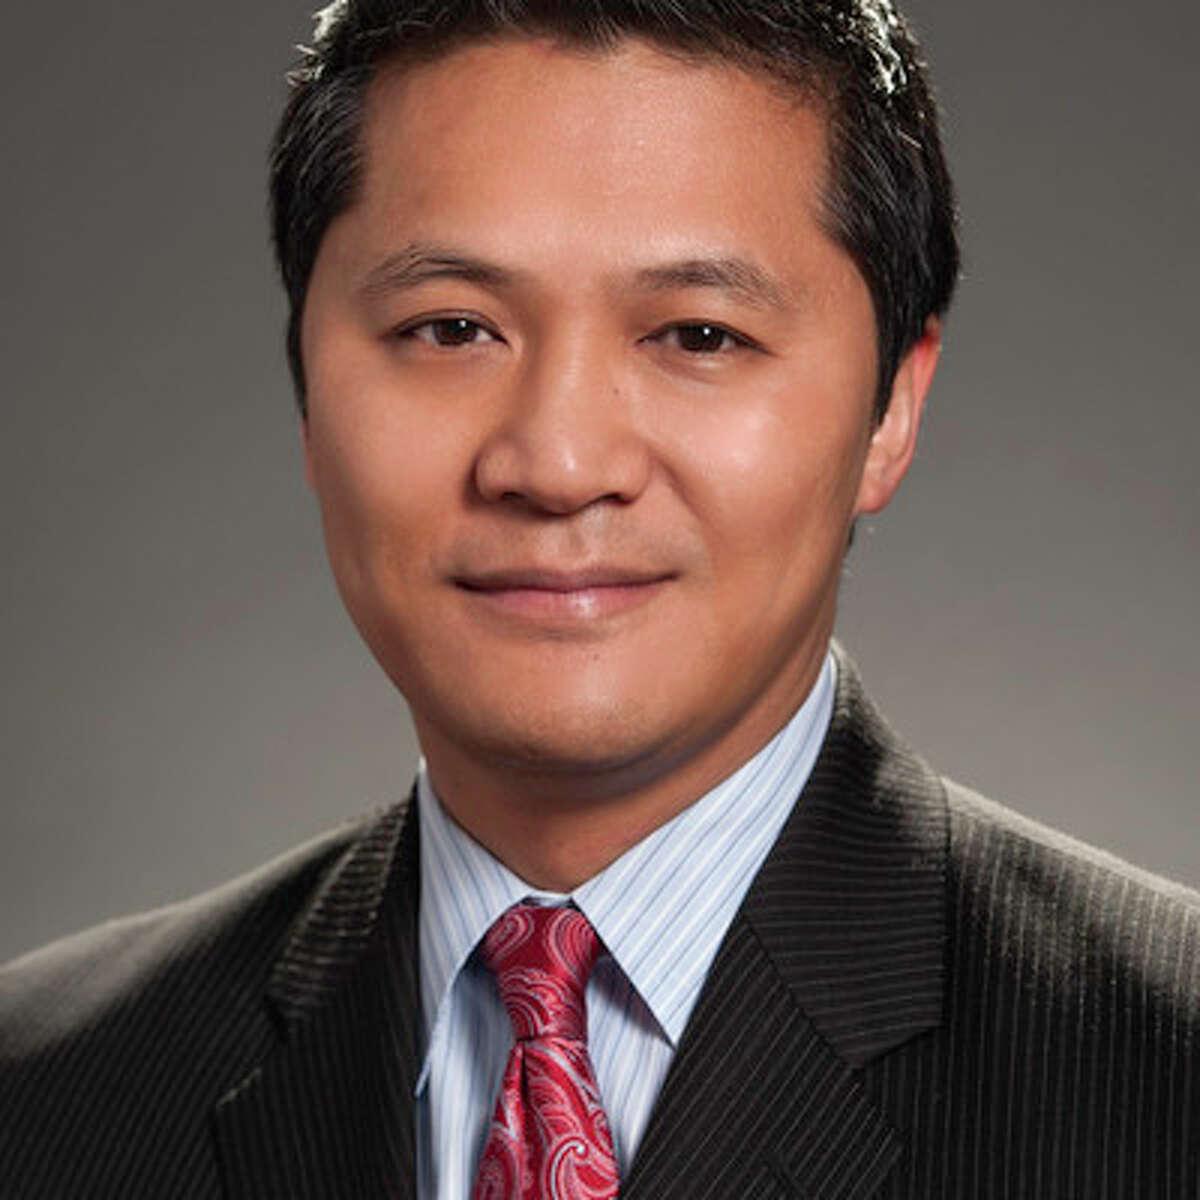 Allen J. Tseng has been named the new chief operating officer for the Memorial Hermann Memorial City Medical Center.